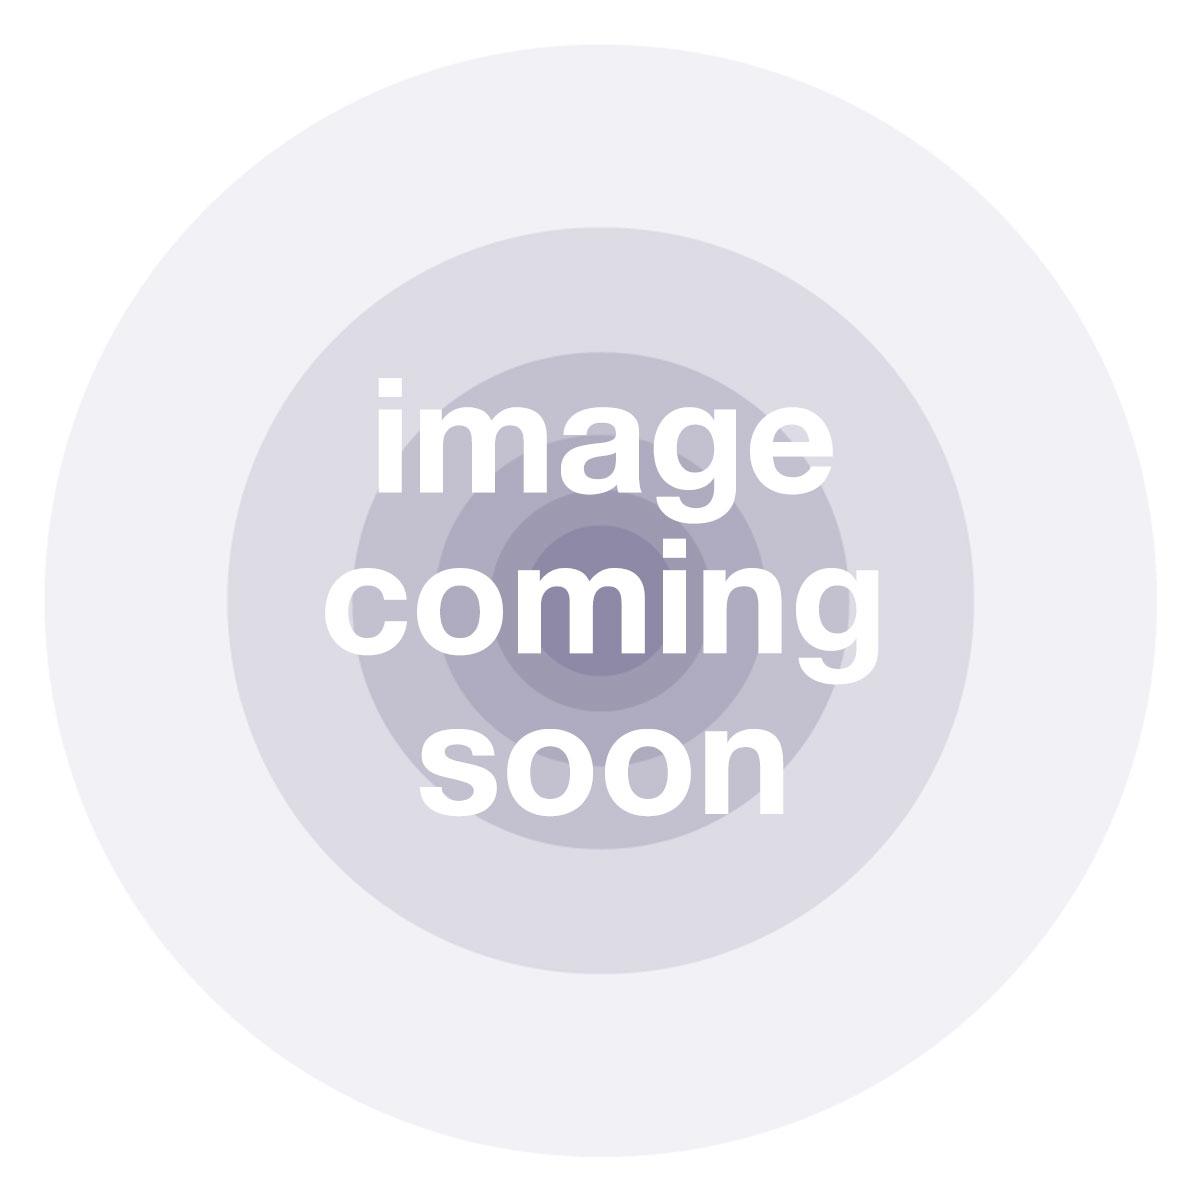 Inogeni Share 1 Dual Input to USB3.0 Converter